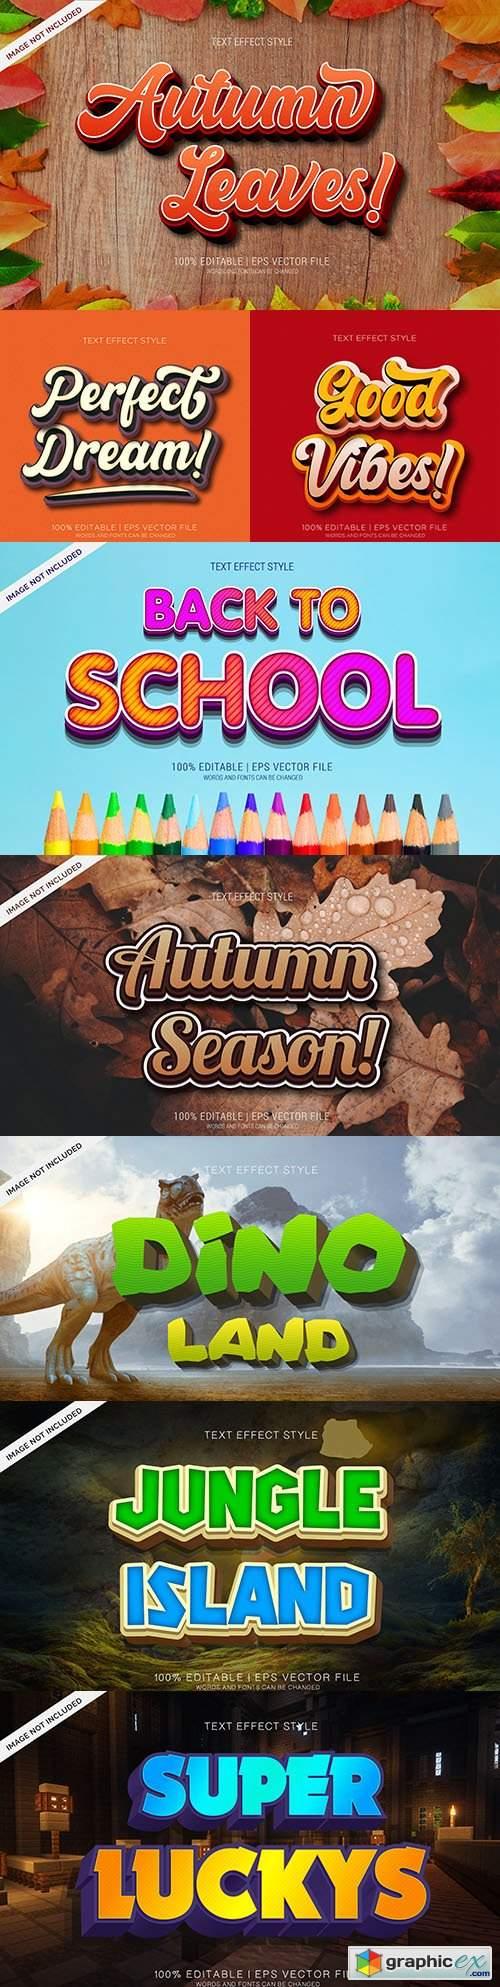 Editable font effect text collection illustration design 153